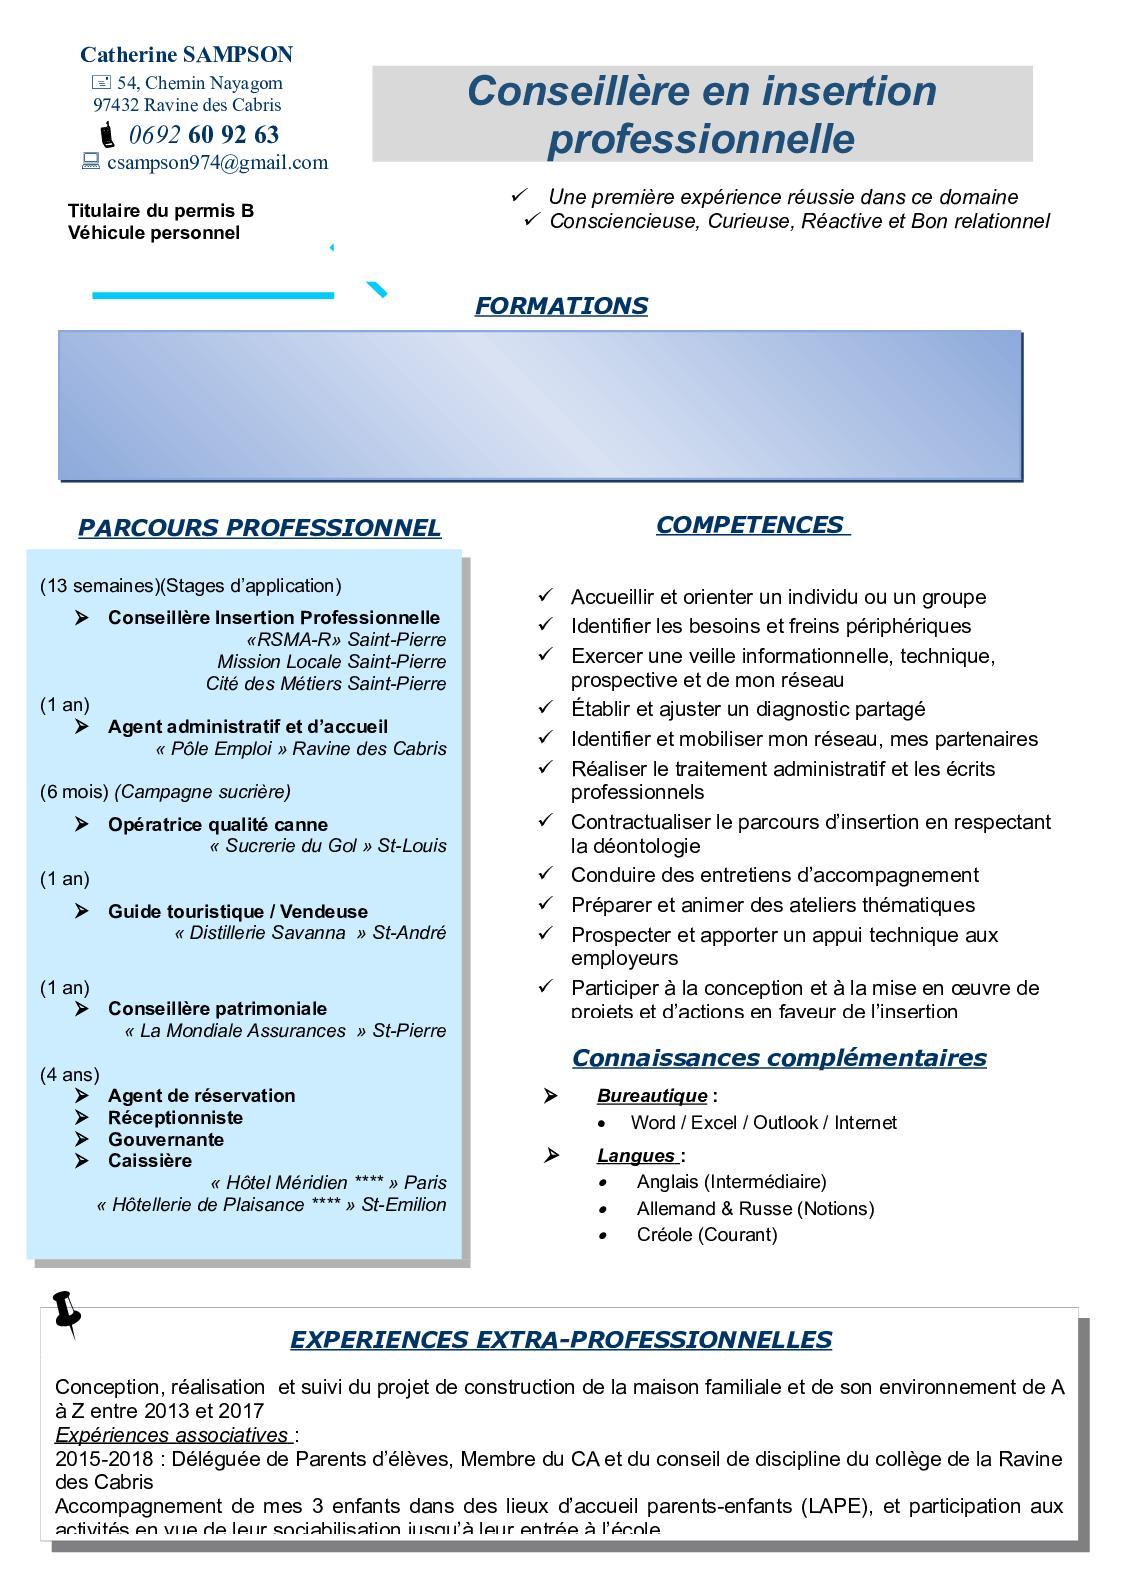 cv conseill u00e8re en insertion professionnelle  u2013 sherlock holmes